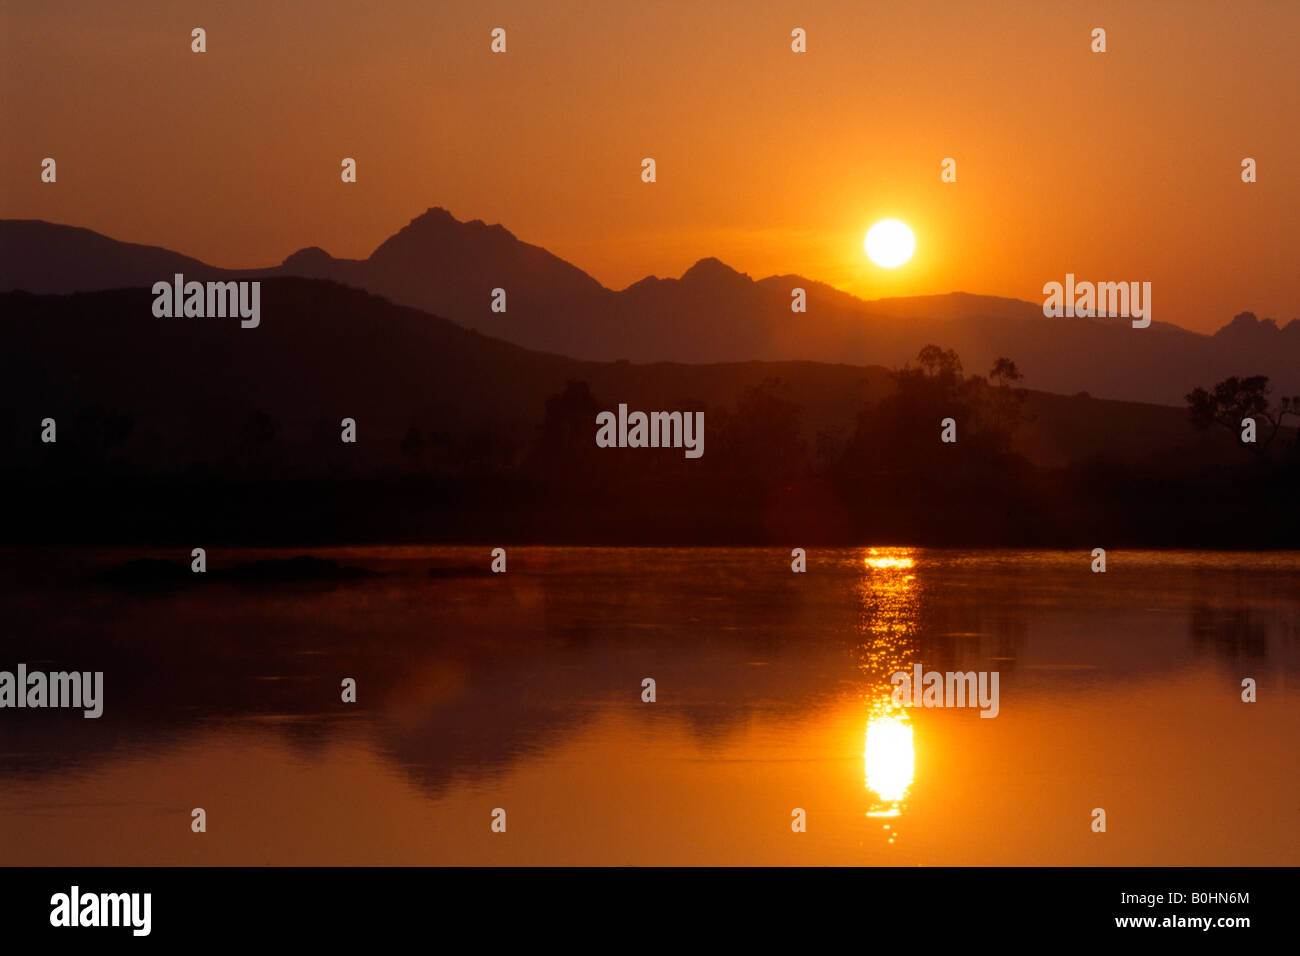 Sunrise over the Karwendel Range, Tyrol, Austria, Europe - Stock Image